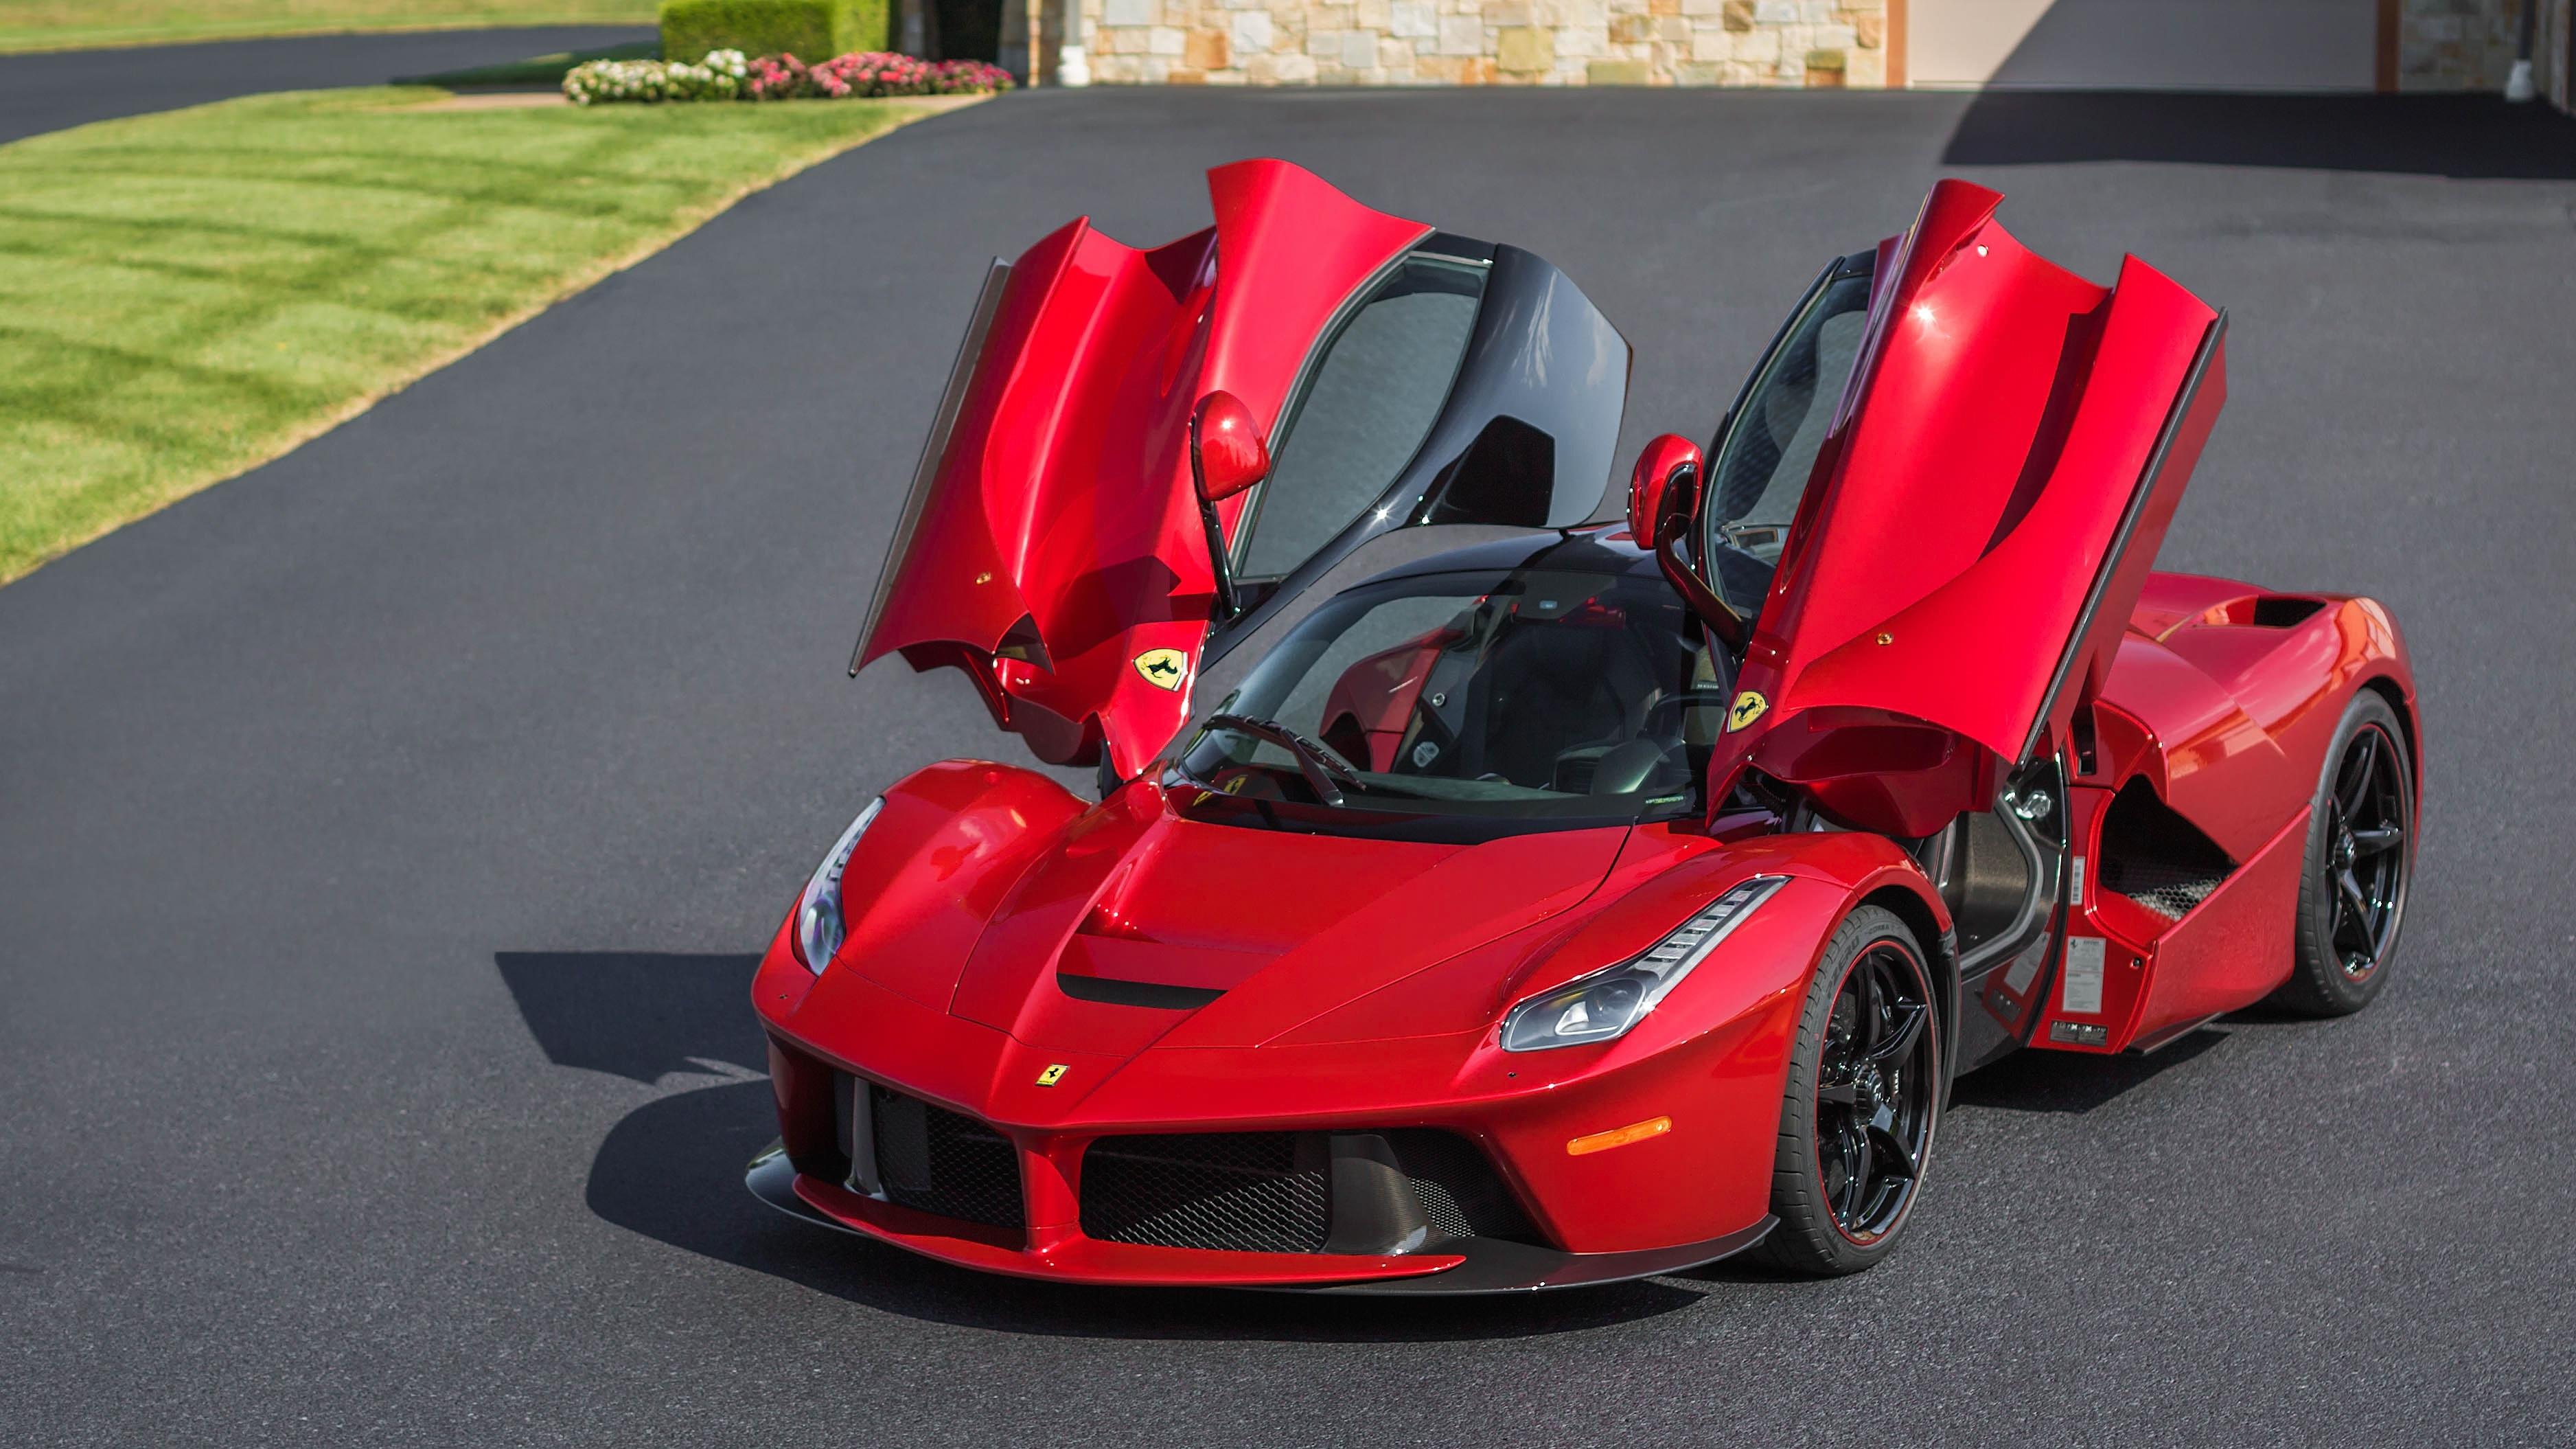 Car Ferrari Ferrari Laferrari Red Car Sport Car Supercar Vehicle Wallpaper Resolution 3752x2110 Id 780267 Wallha Com